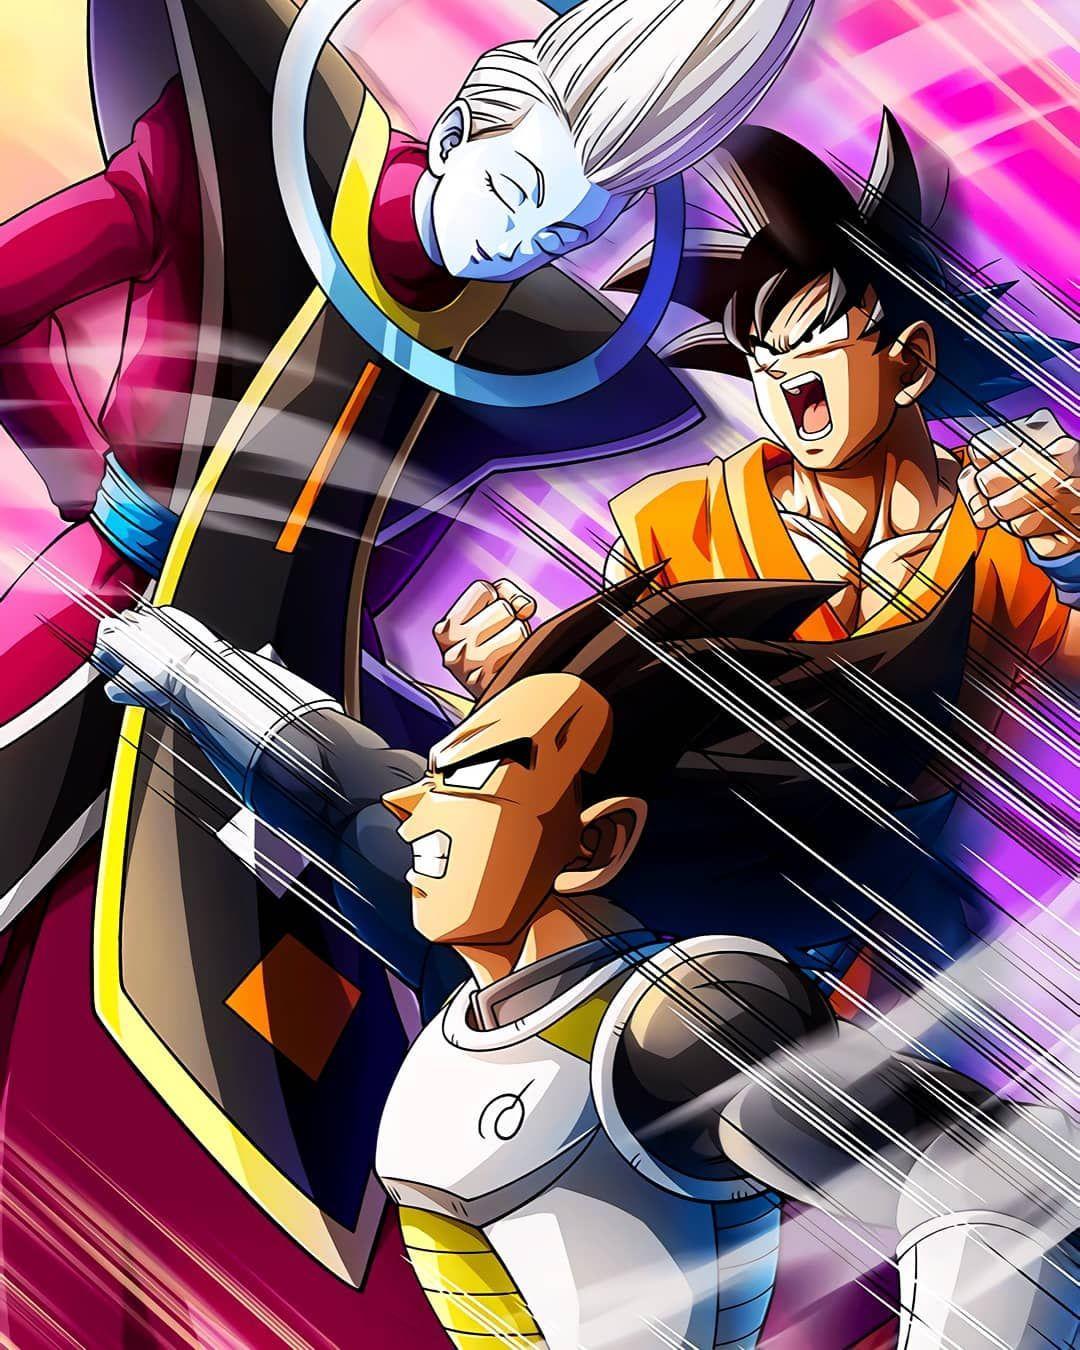 Goku Y Vegeta Entrenadando Con Whis Dbz Dbs Dragonball Fairytale Ssj Tokiogo Dragon Ball Wallpapers Dragon Ball Super Manga Anime Dragon Ball Super